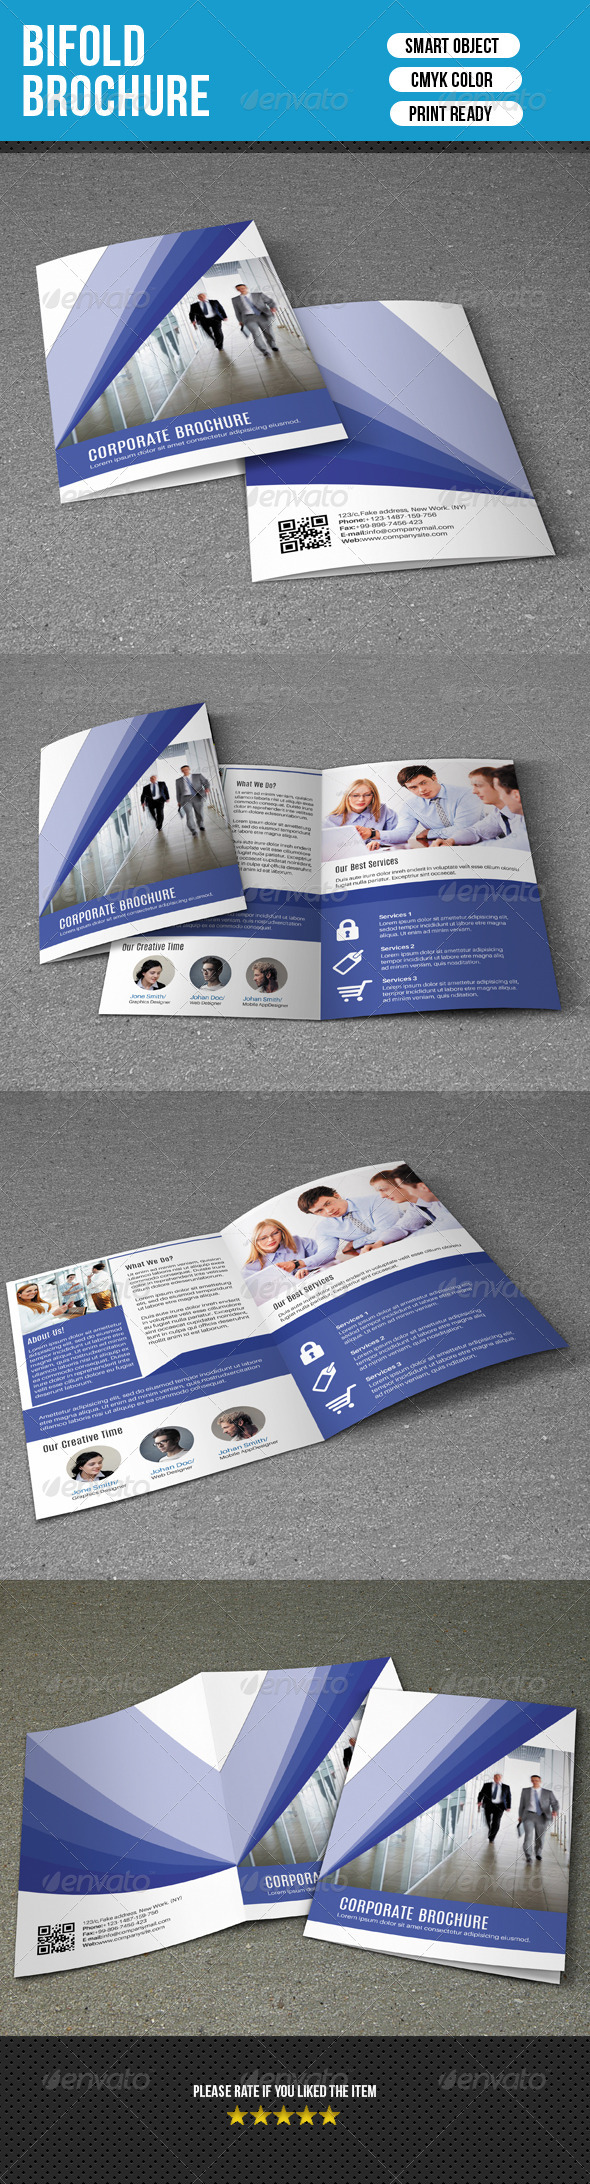 GraphicRiver Bifold Brochure-V93 8279295